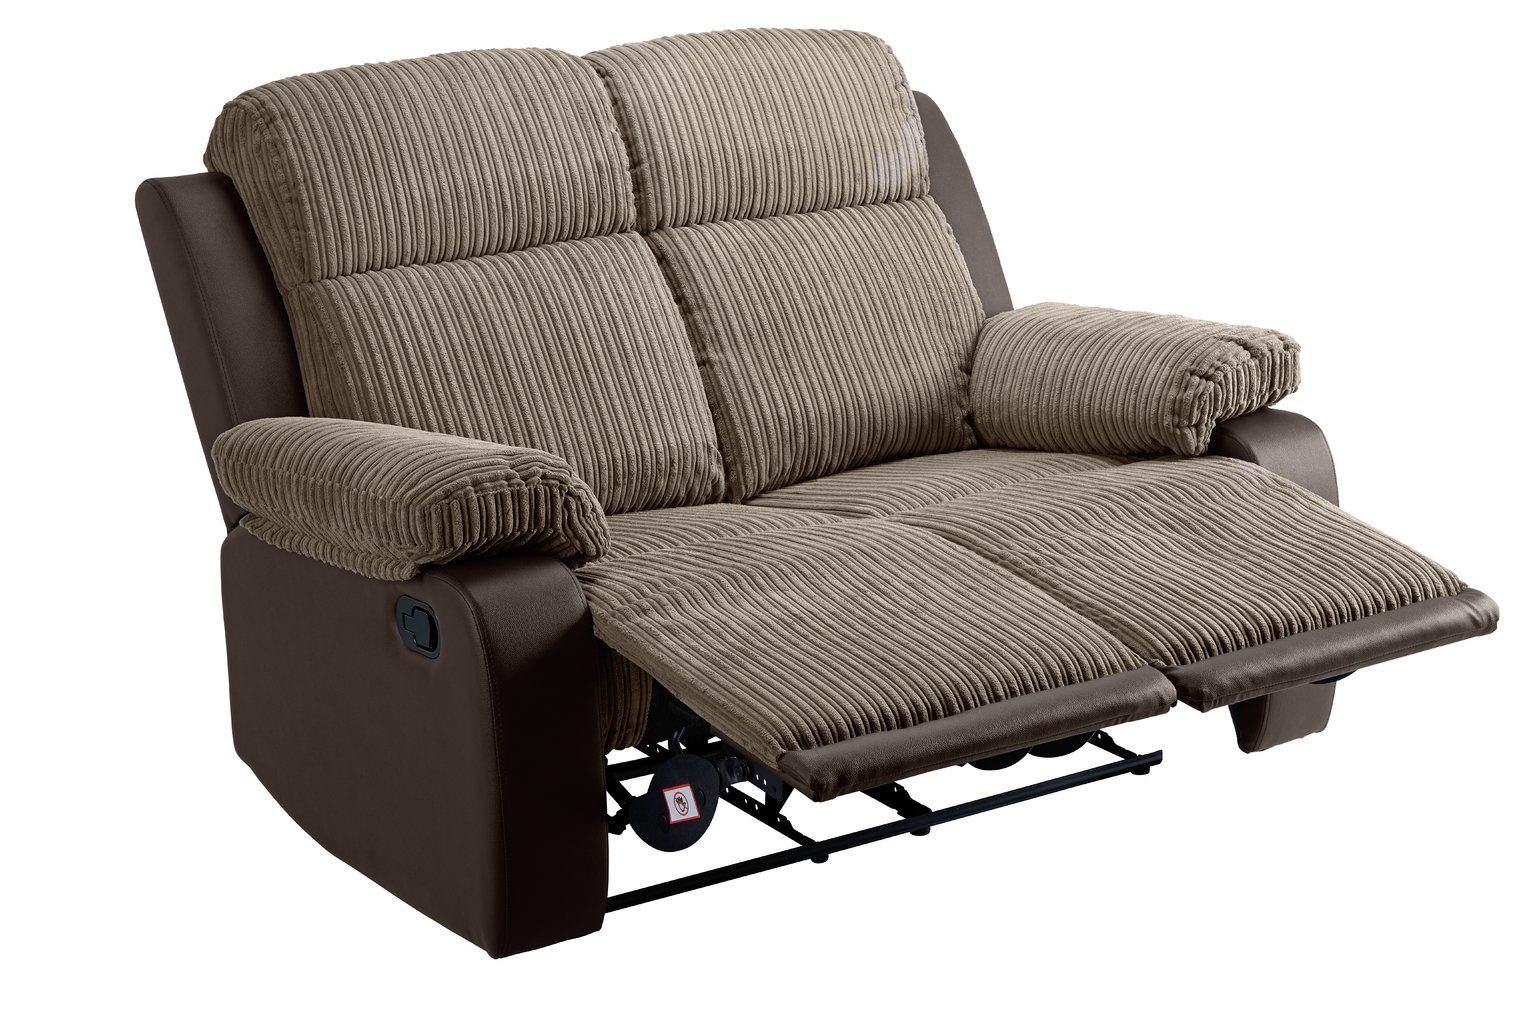 Argos Home Bradley 2 Seater Fabric Recliner Sofa - Natural